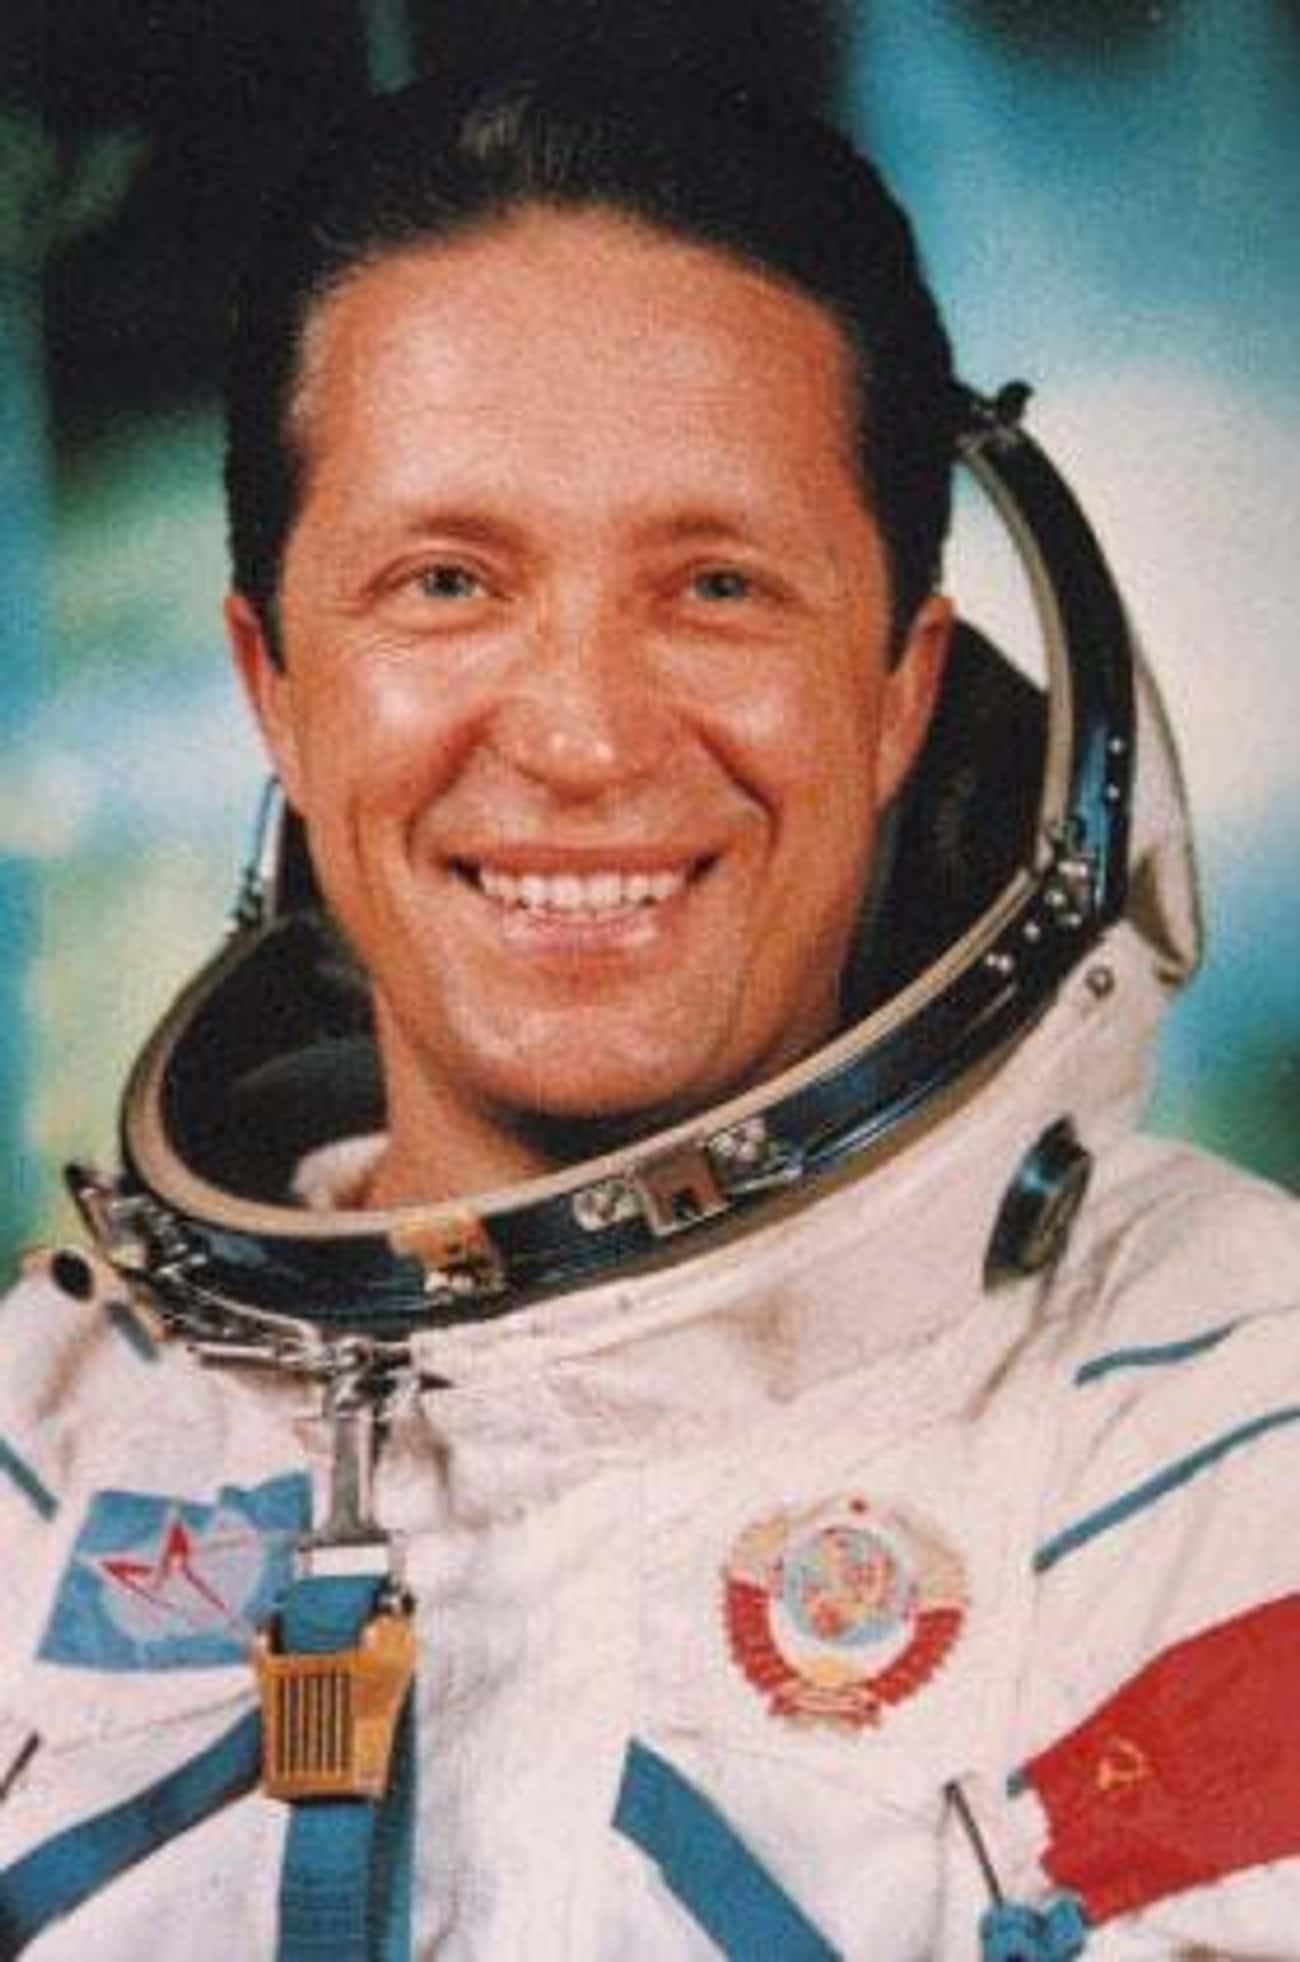 Vladimir Aksyonov